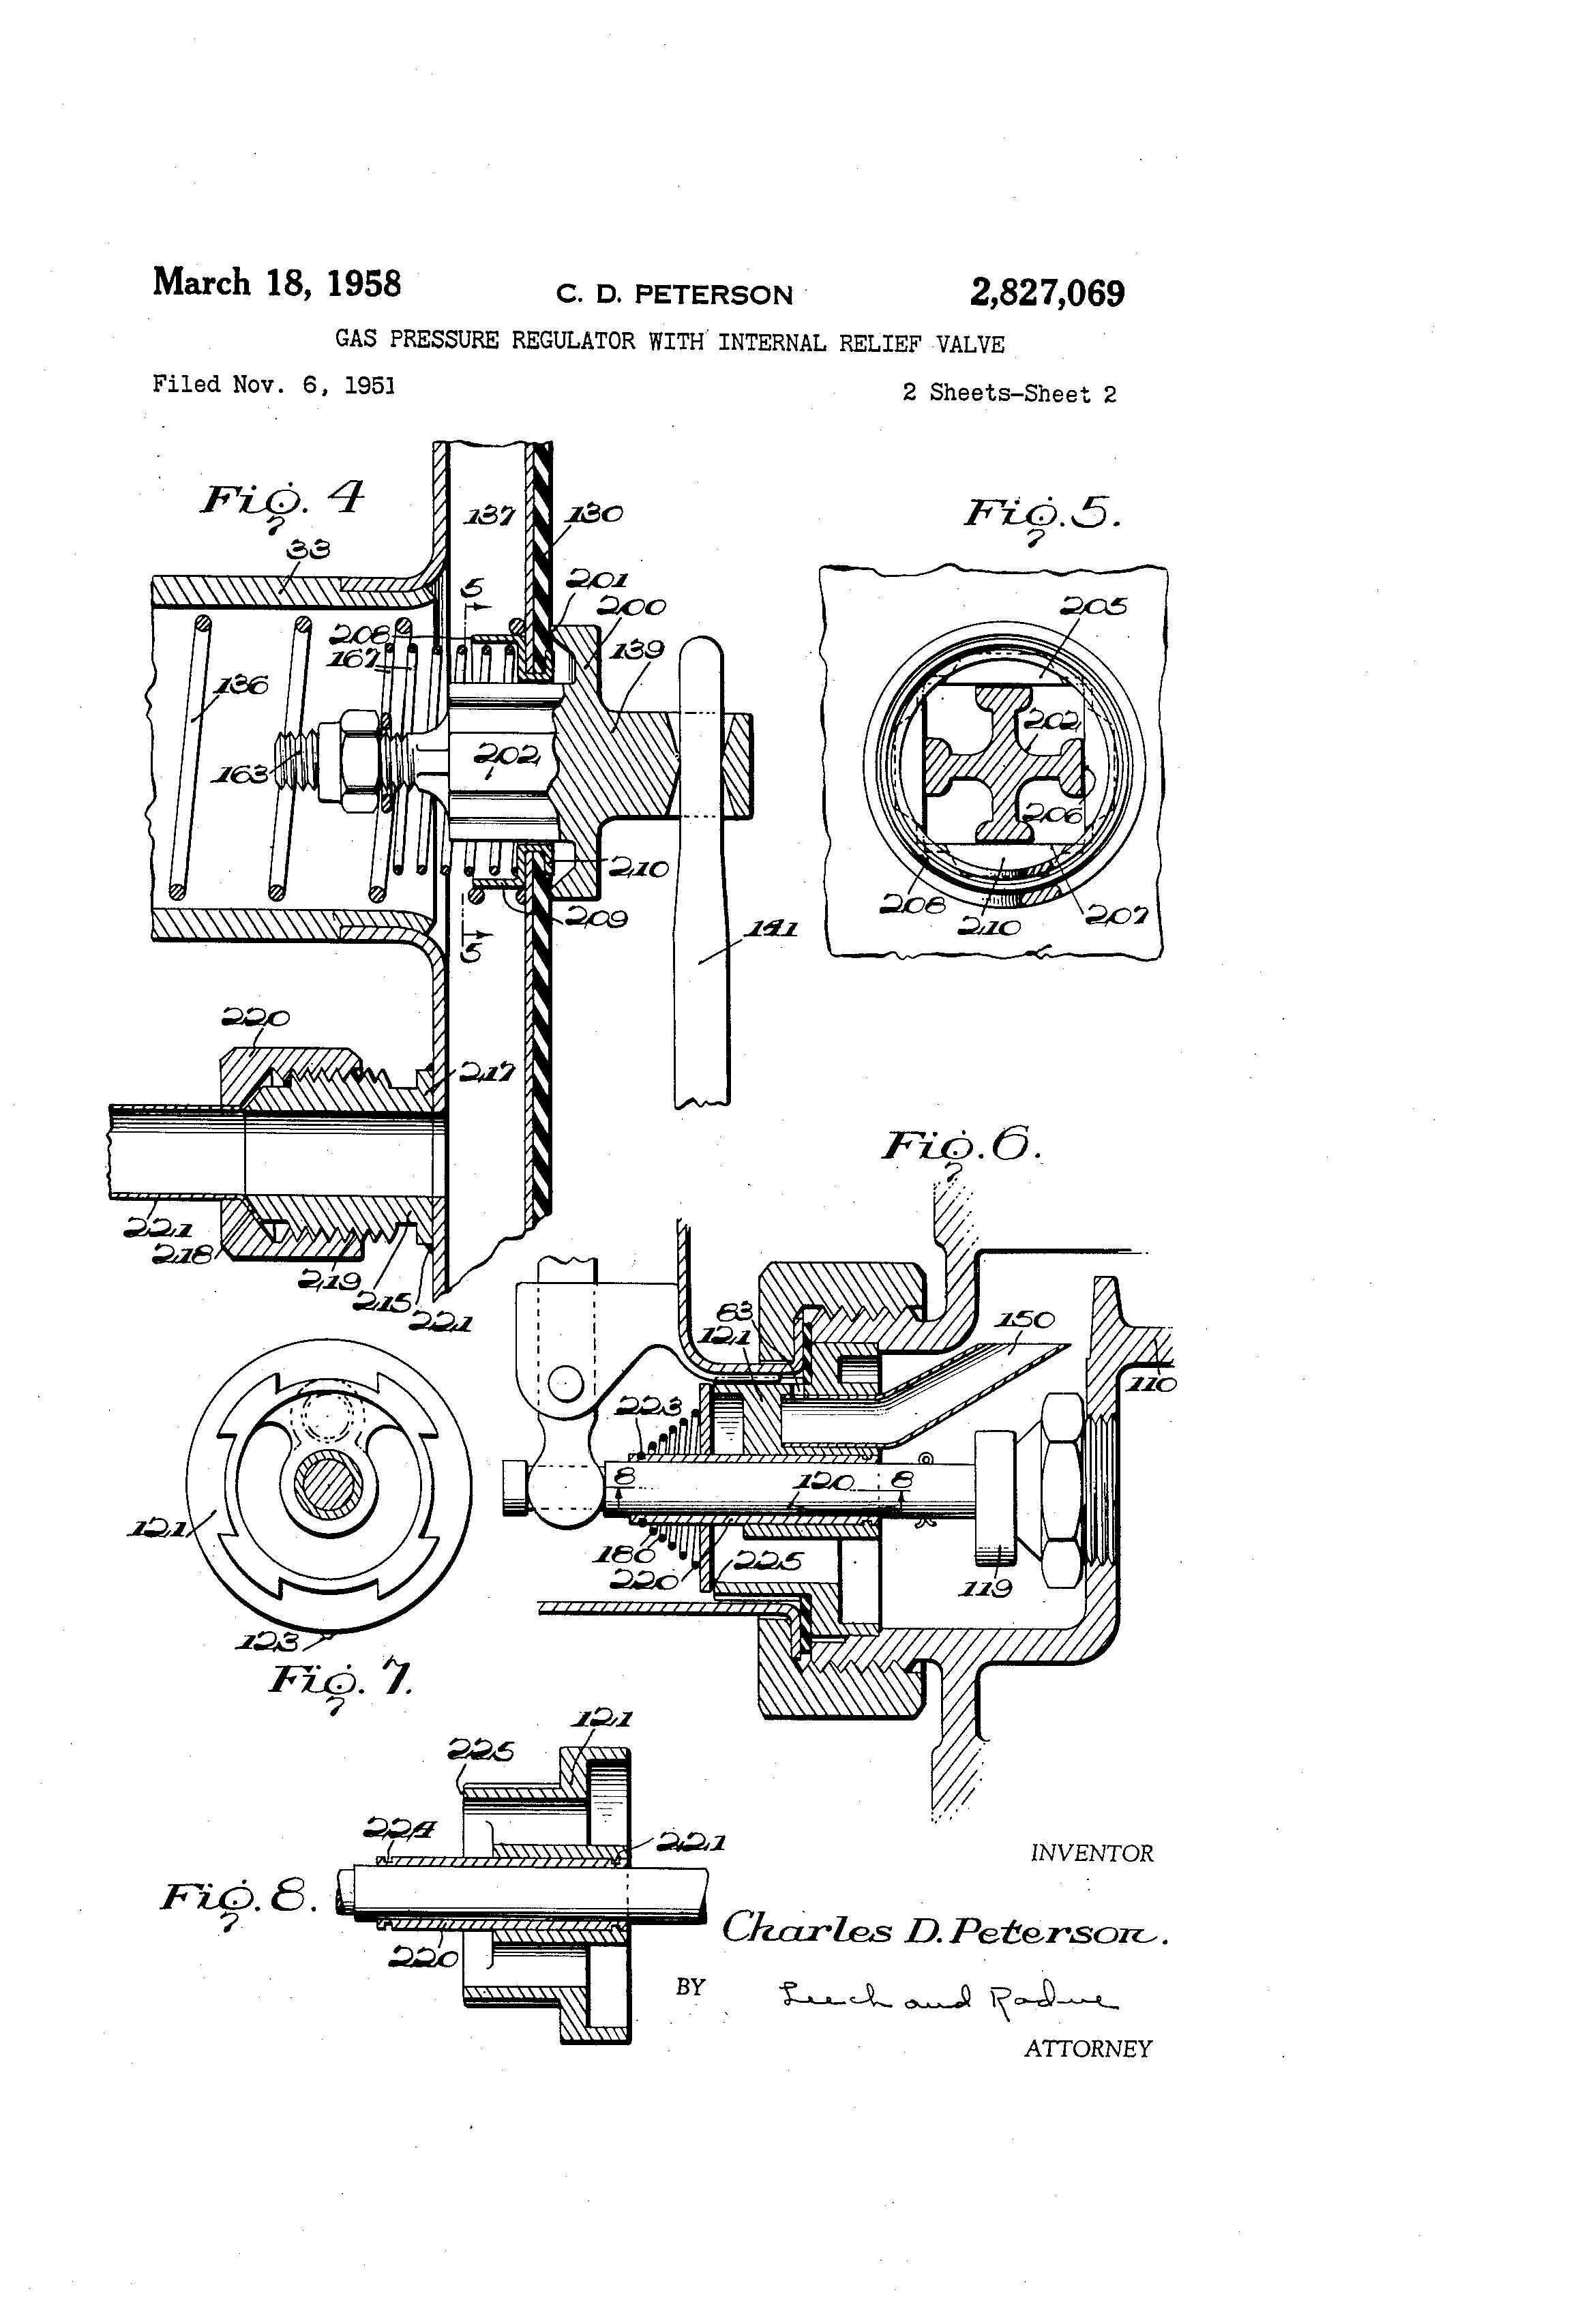 wiring diagram 2010 oem service manual volvo wiring s40 04 v50 c70 06